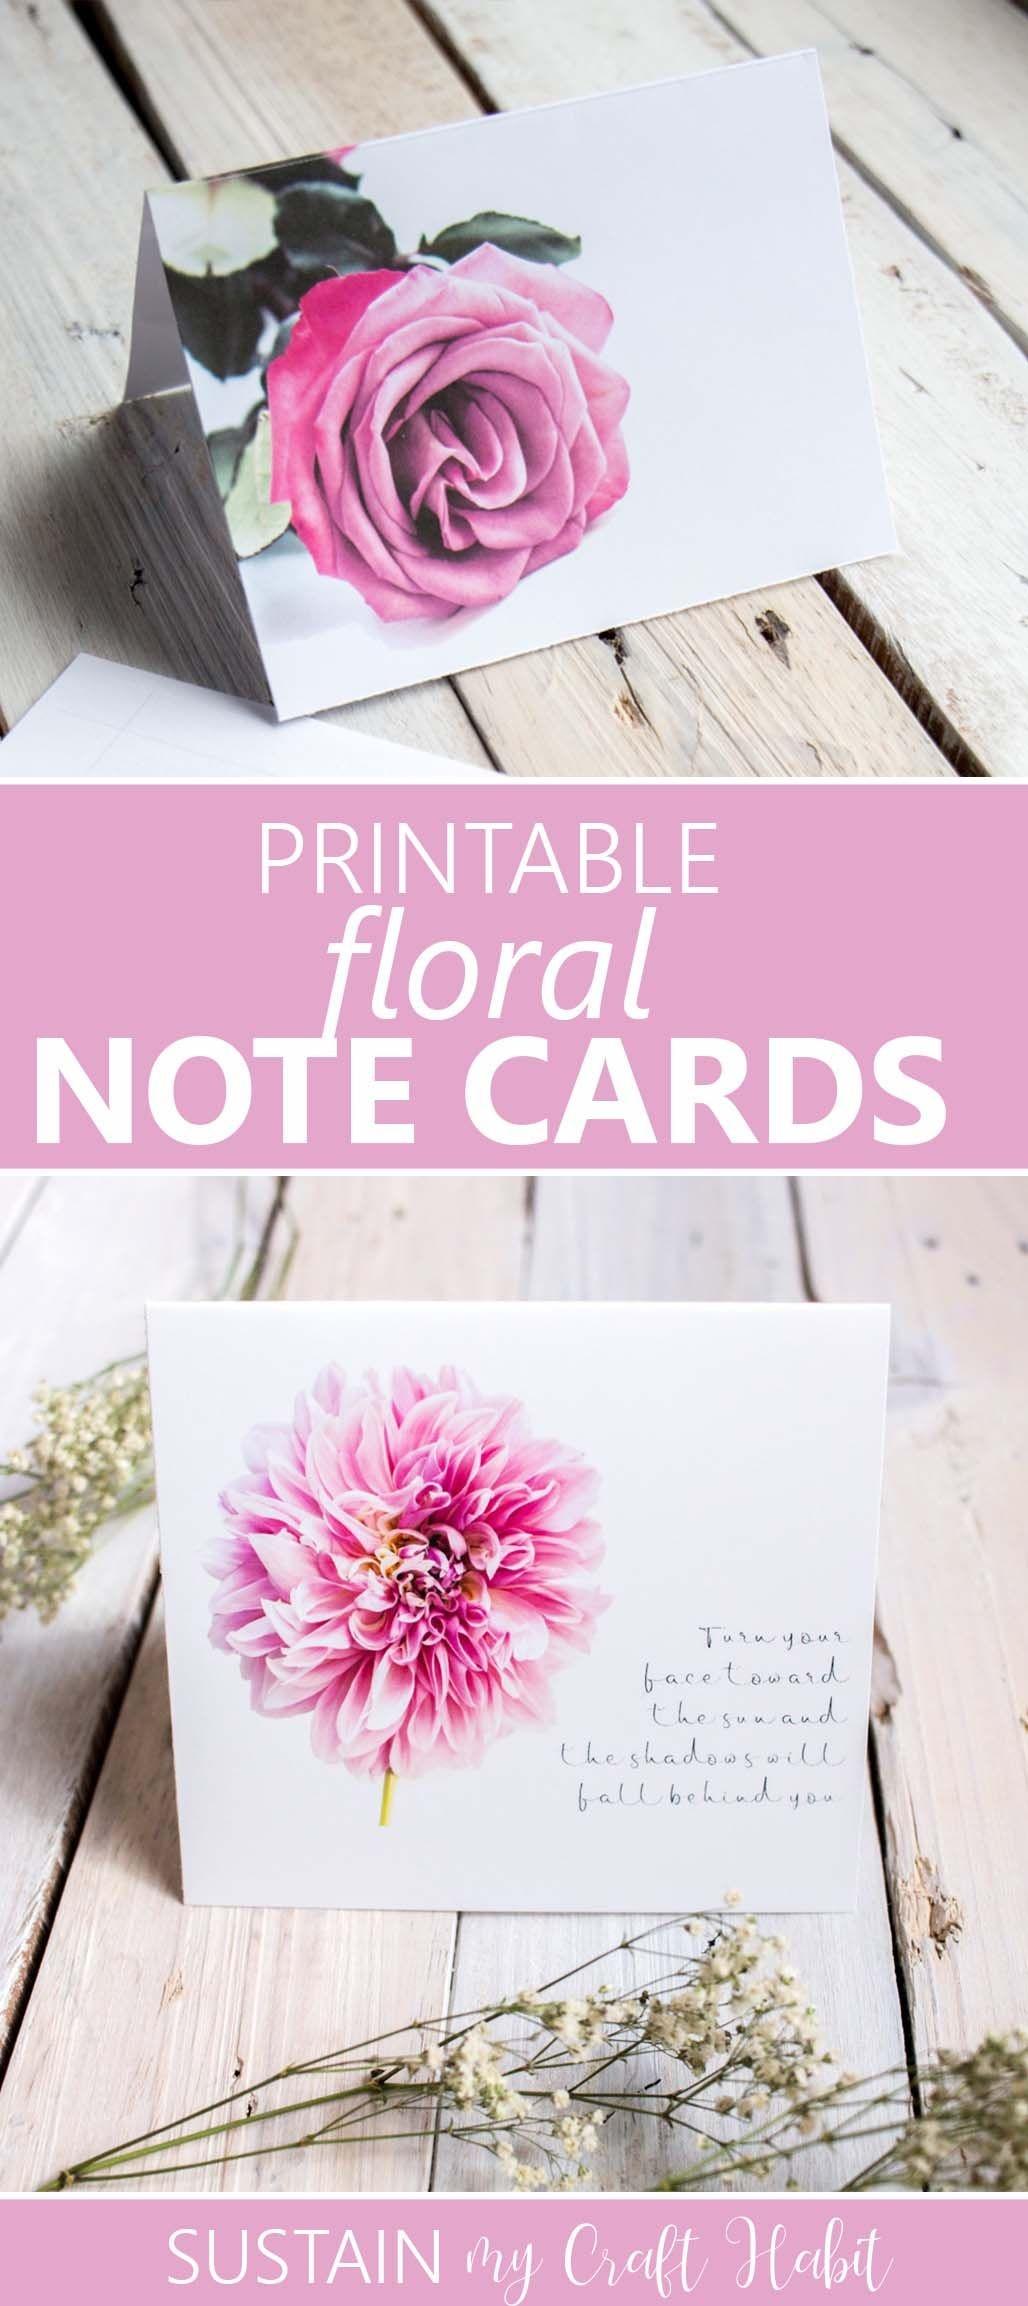 Printable Floral Note Cards | Free Printables  | Pinterest - Free Printable Note Cards